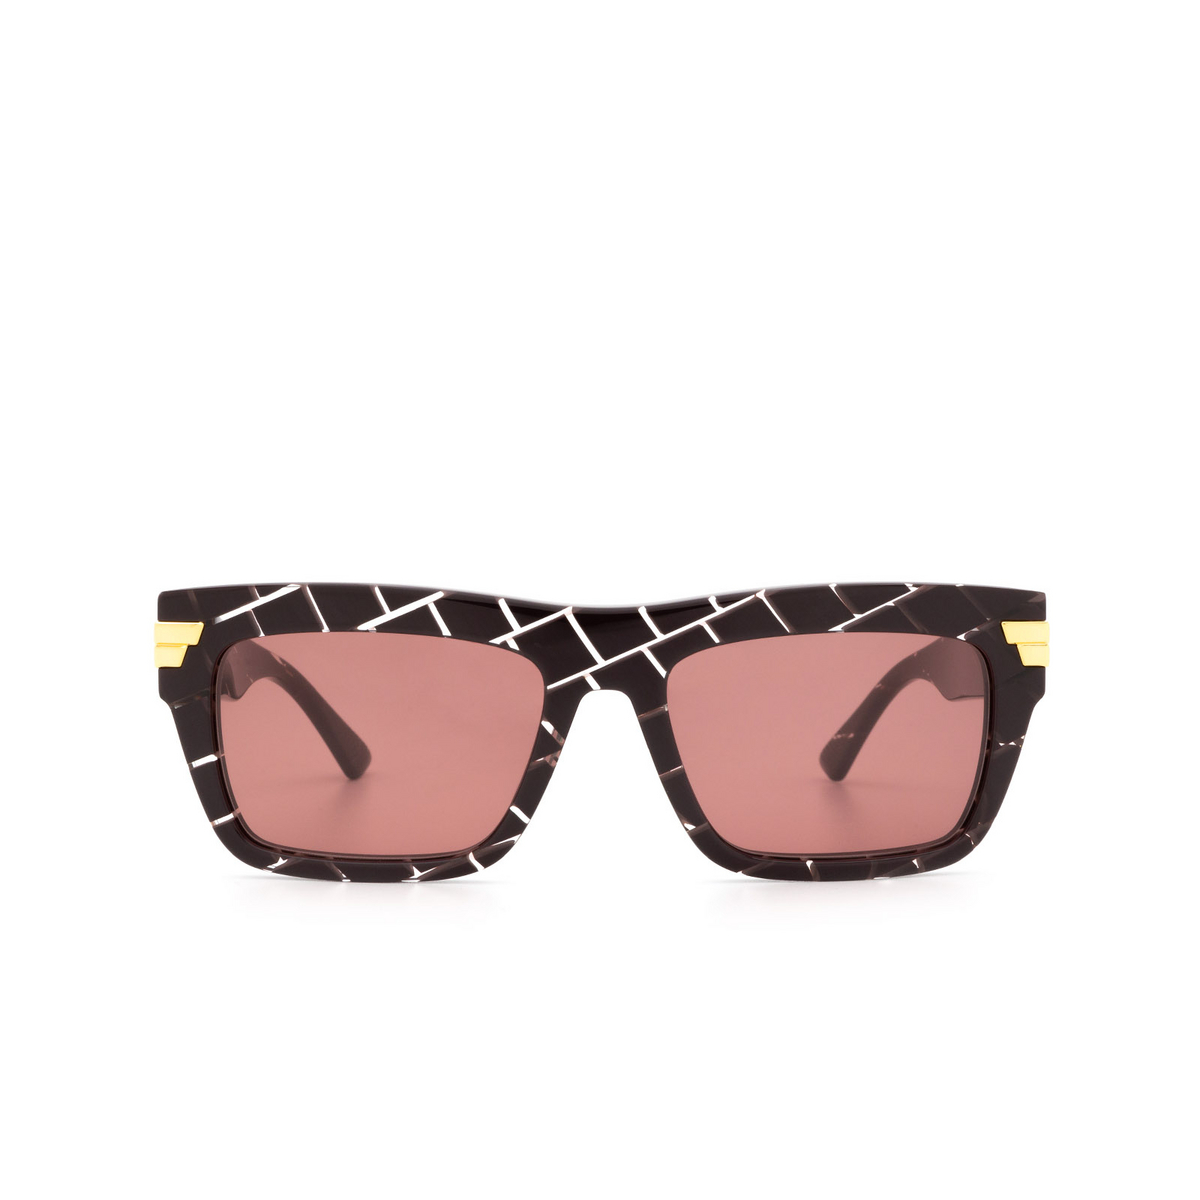 Bottega Veneta® Rectangle Sunglasses: BV1058S color Burgundy 003 - front view.